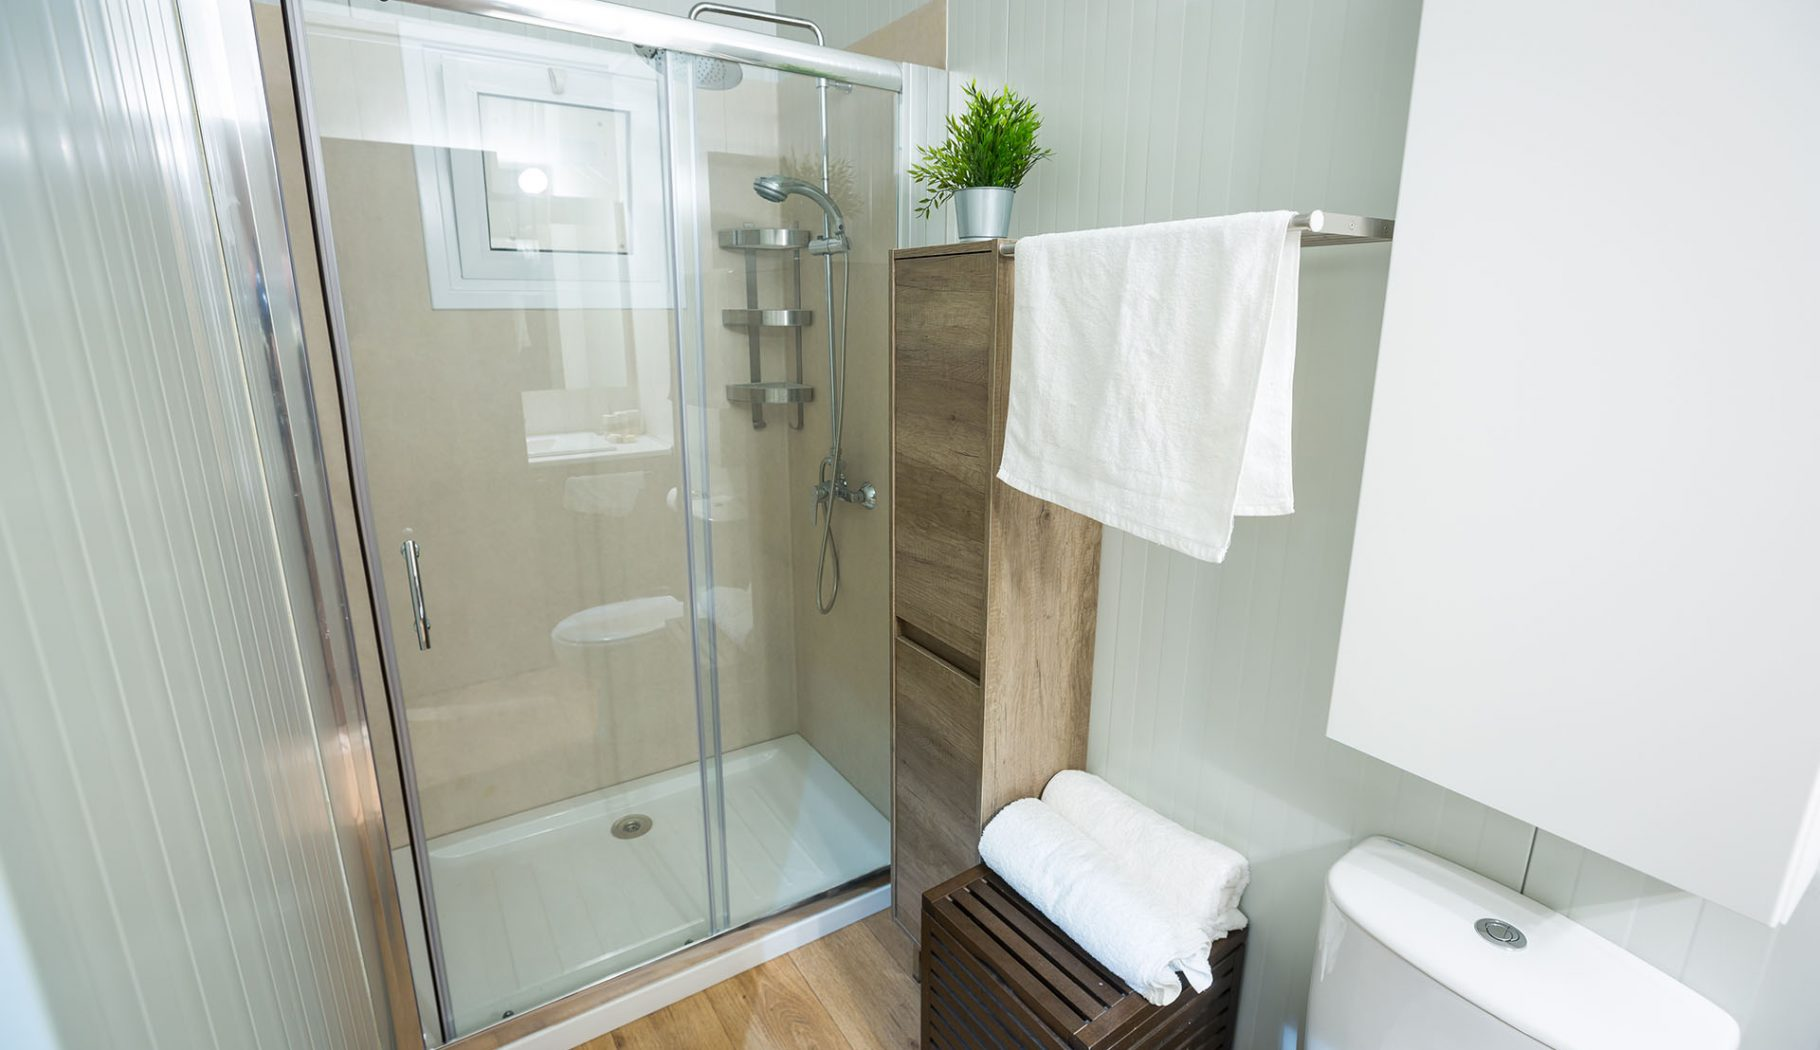 villa's bathroom panorama edge